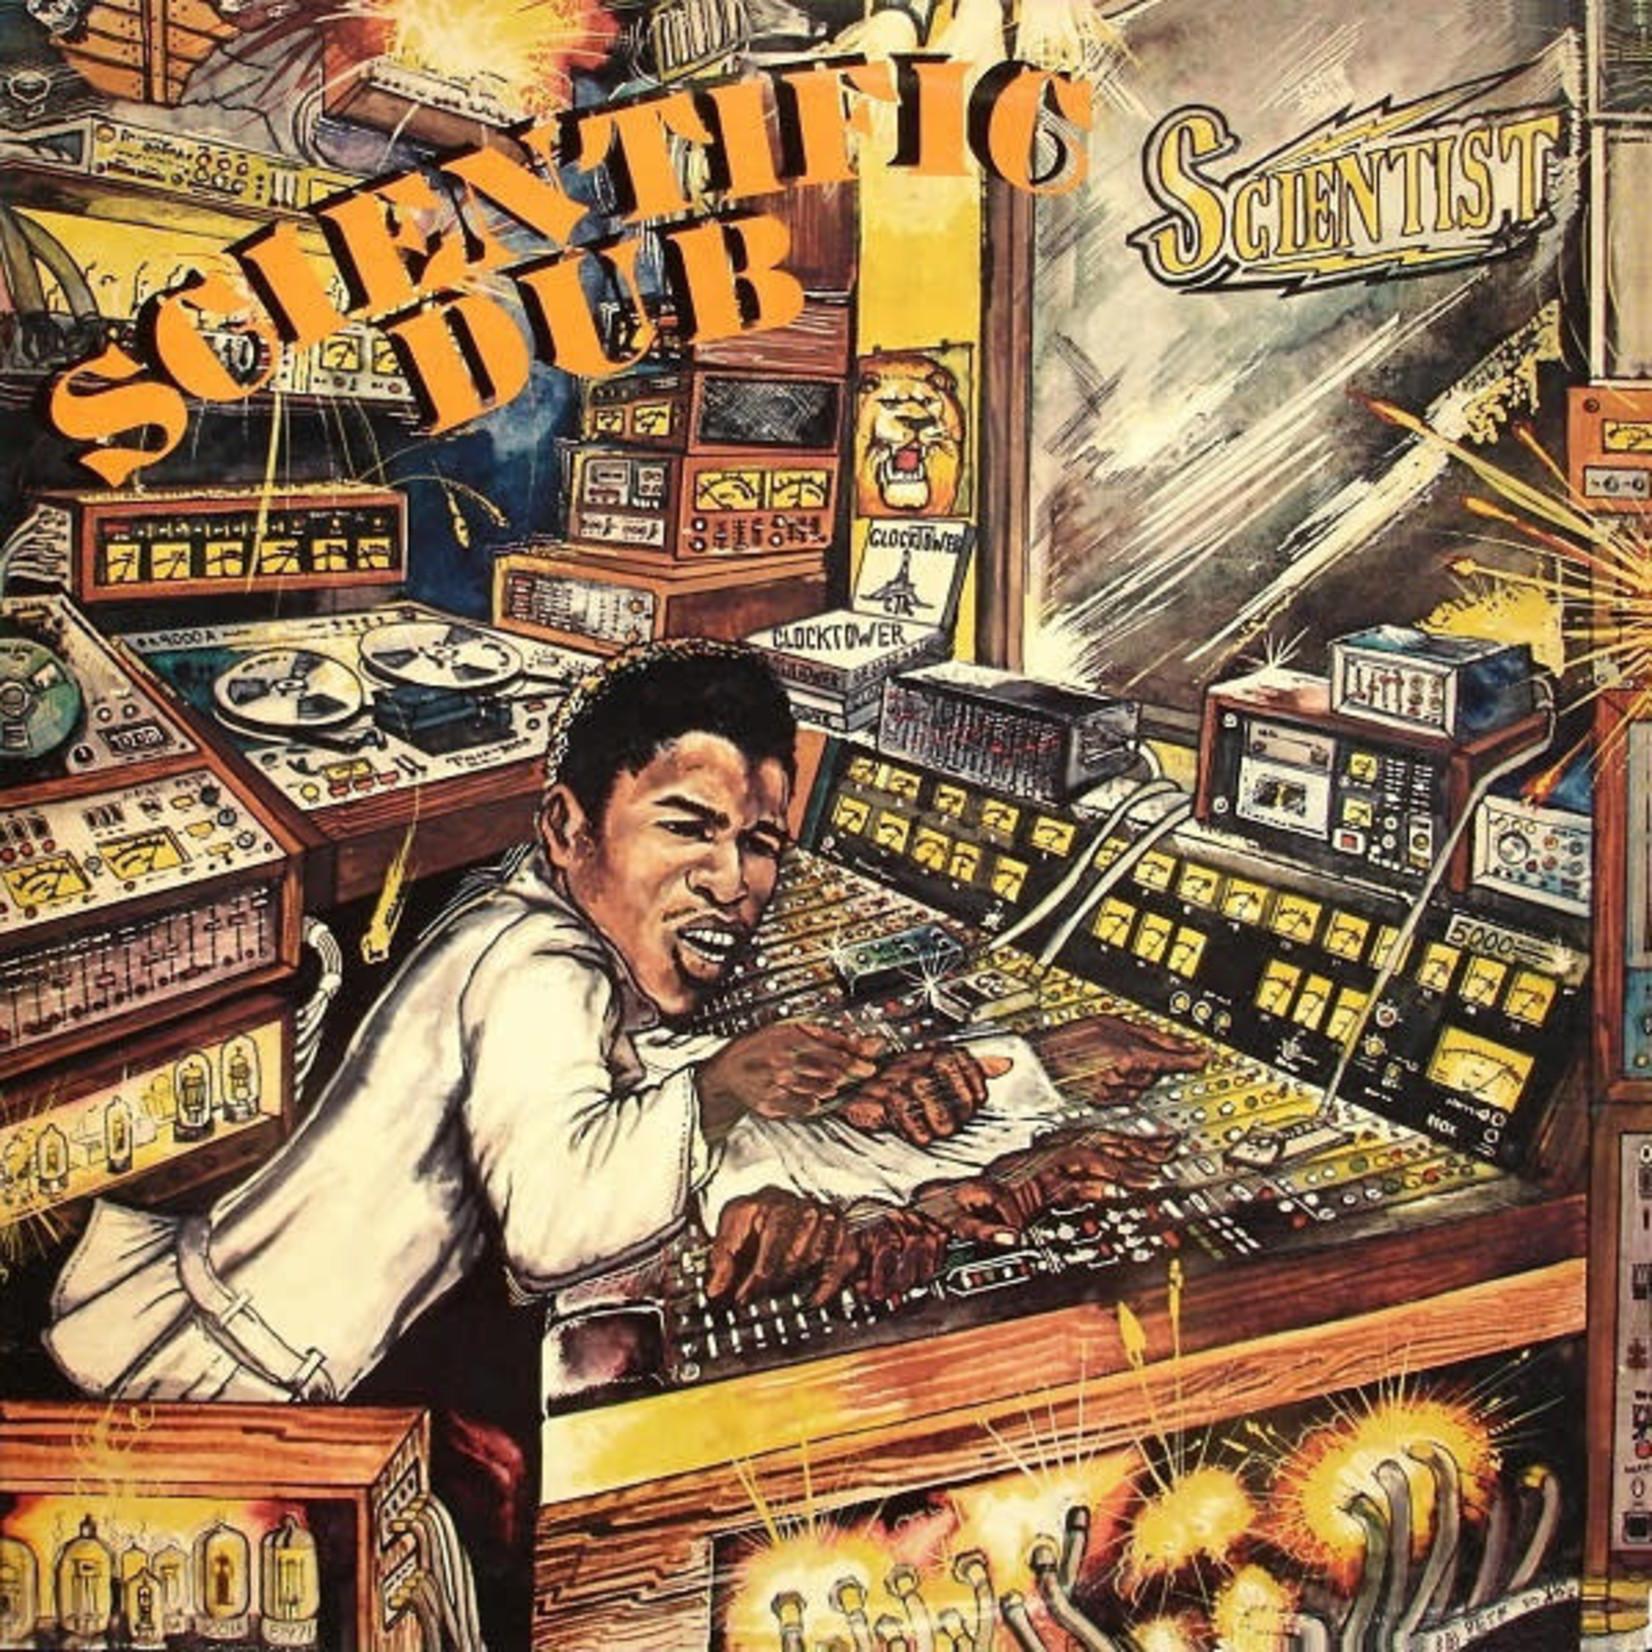 [New] Scientist: Scientific Dub